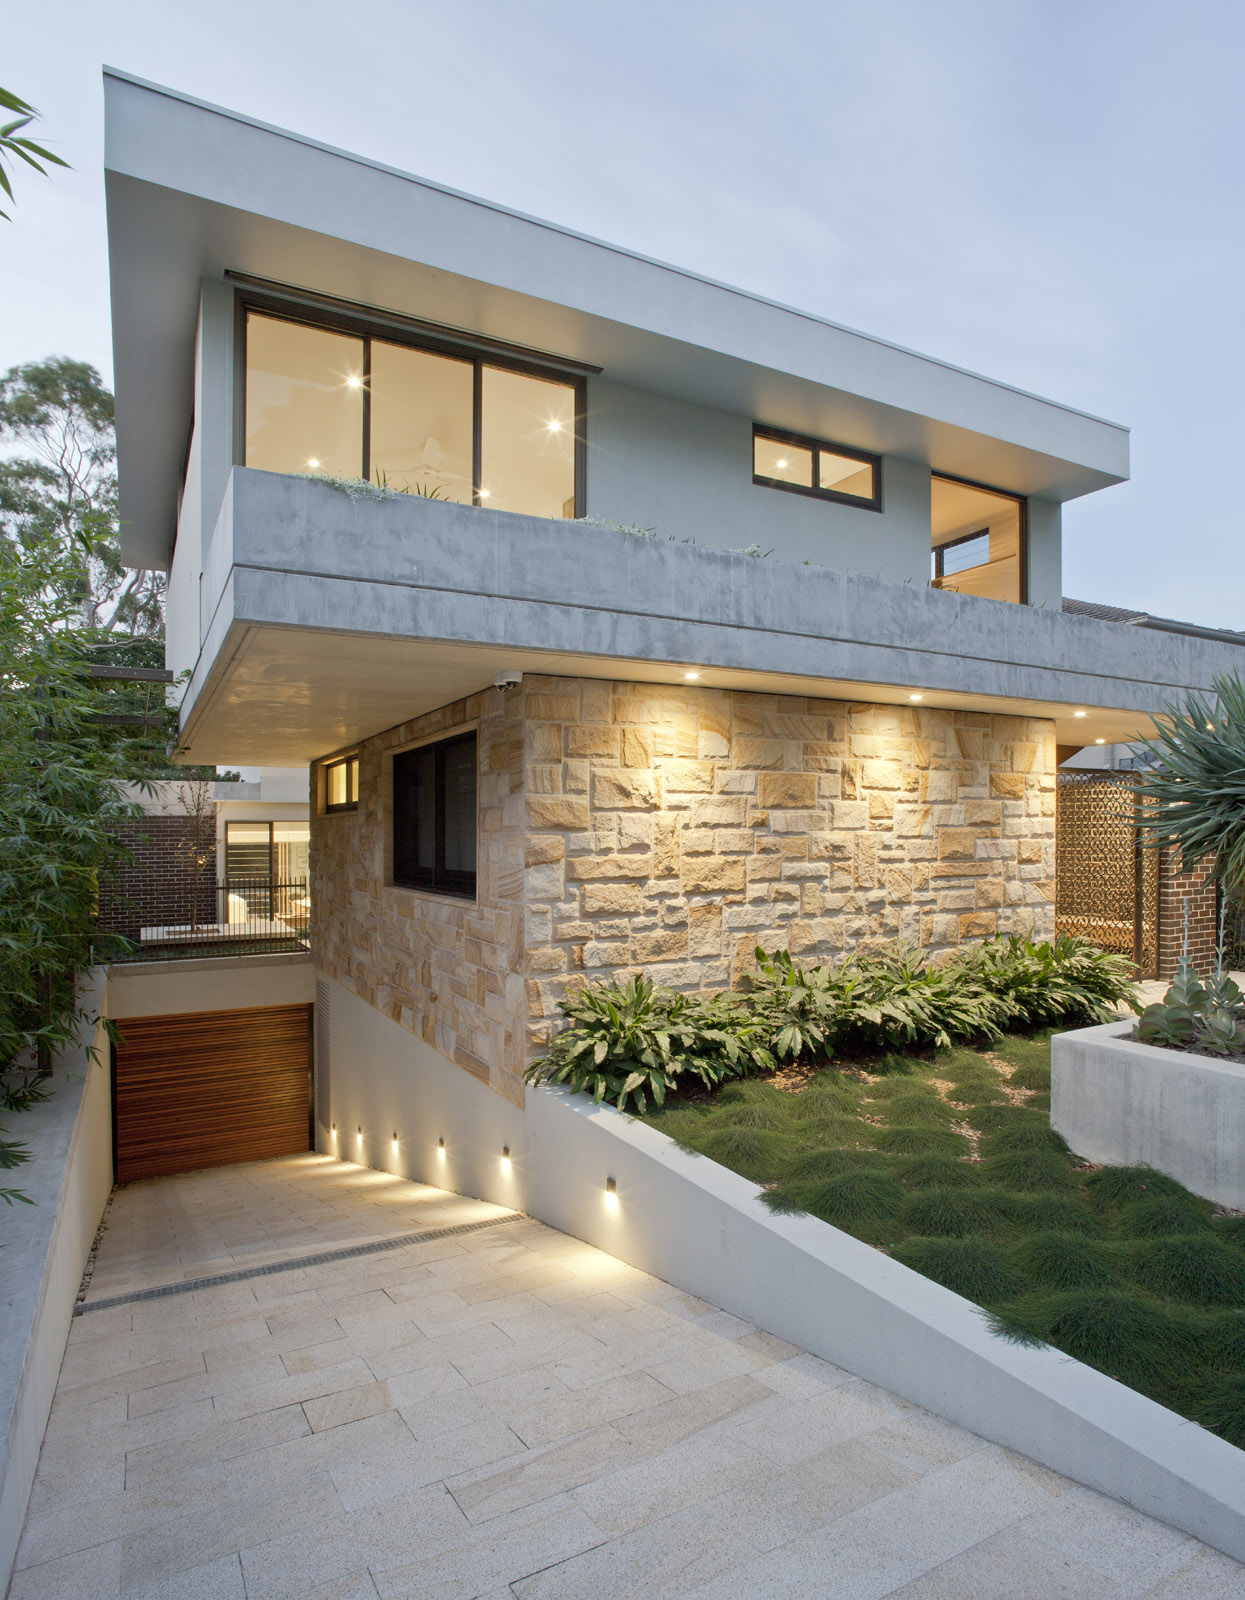 SWP_SRAI-CONCORD HOUSE_IMG_5242.jpg